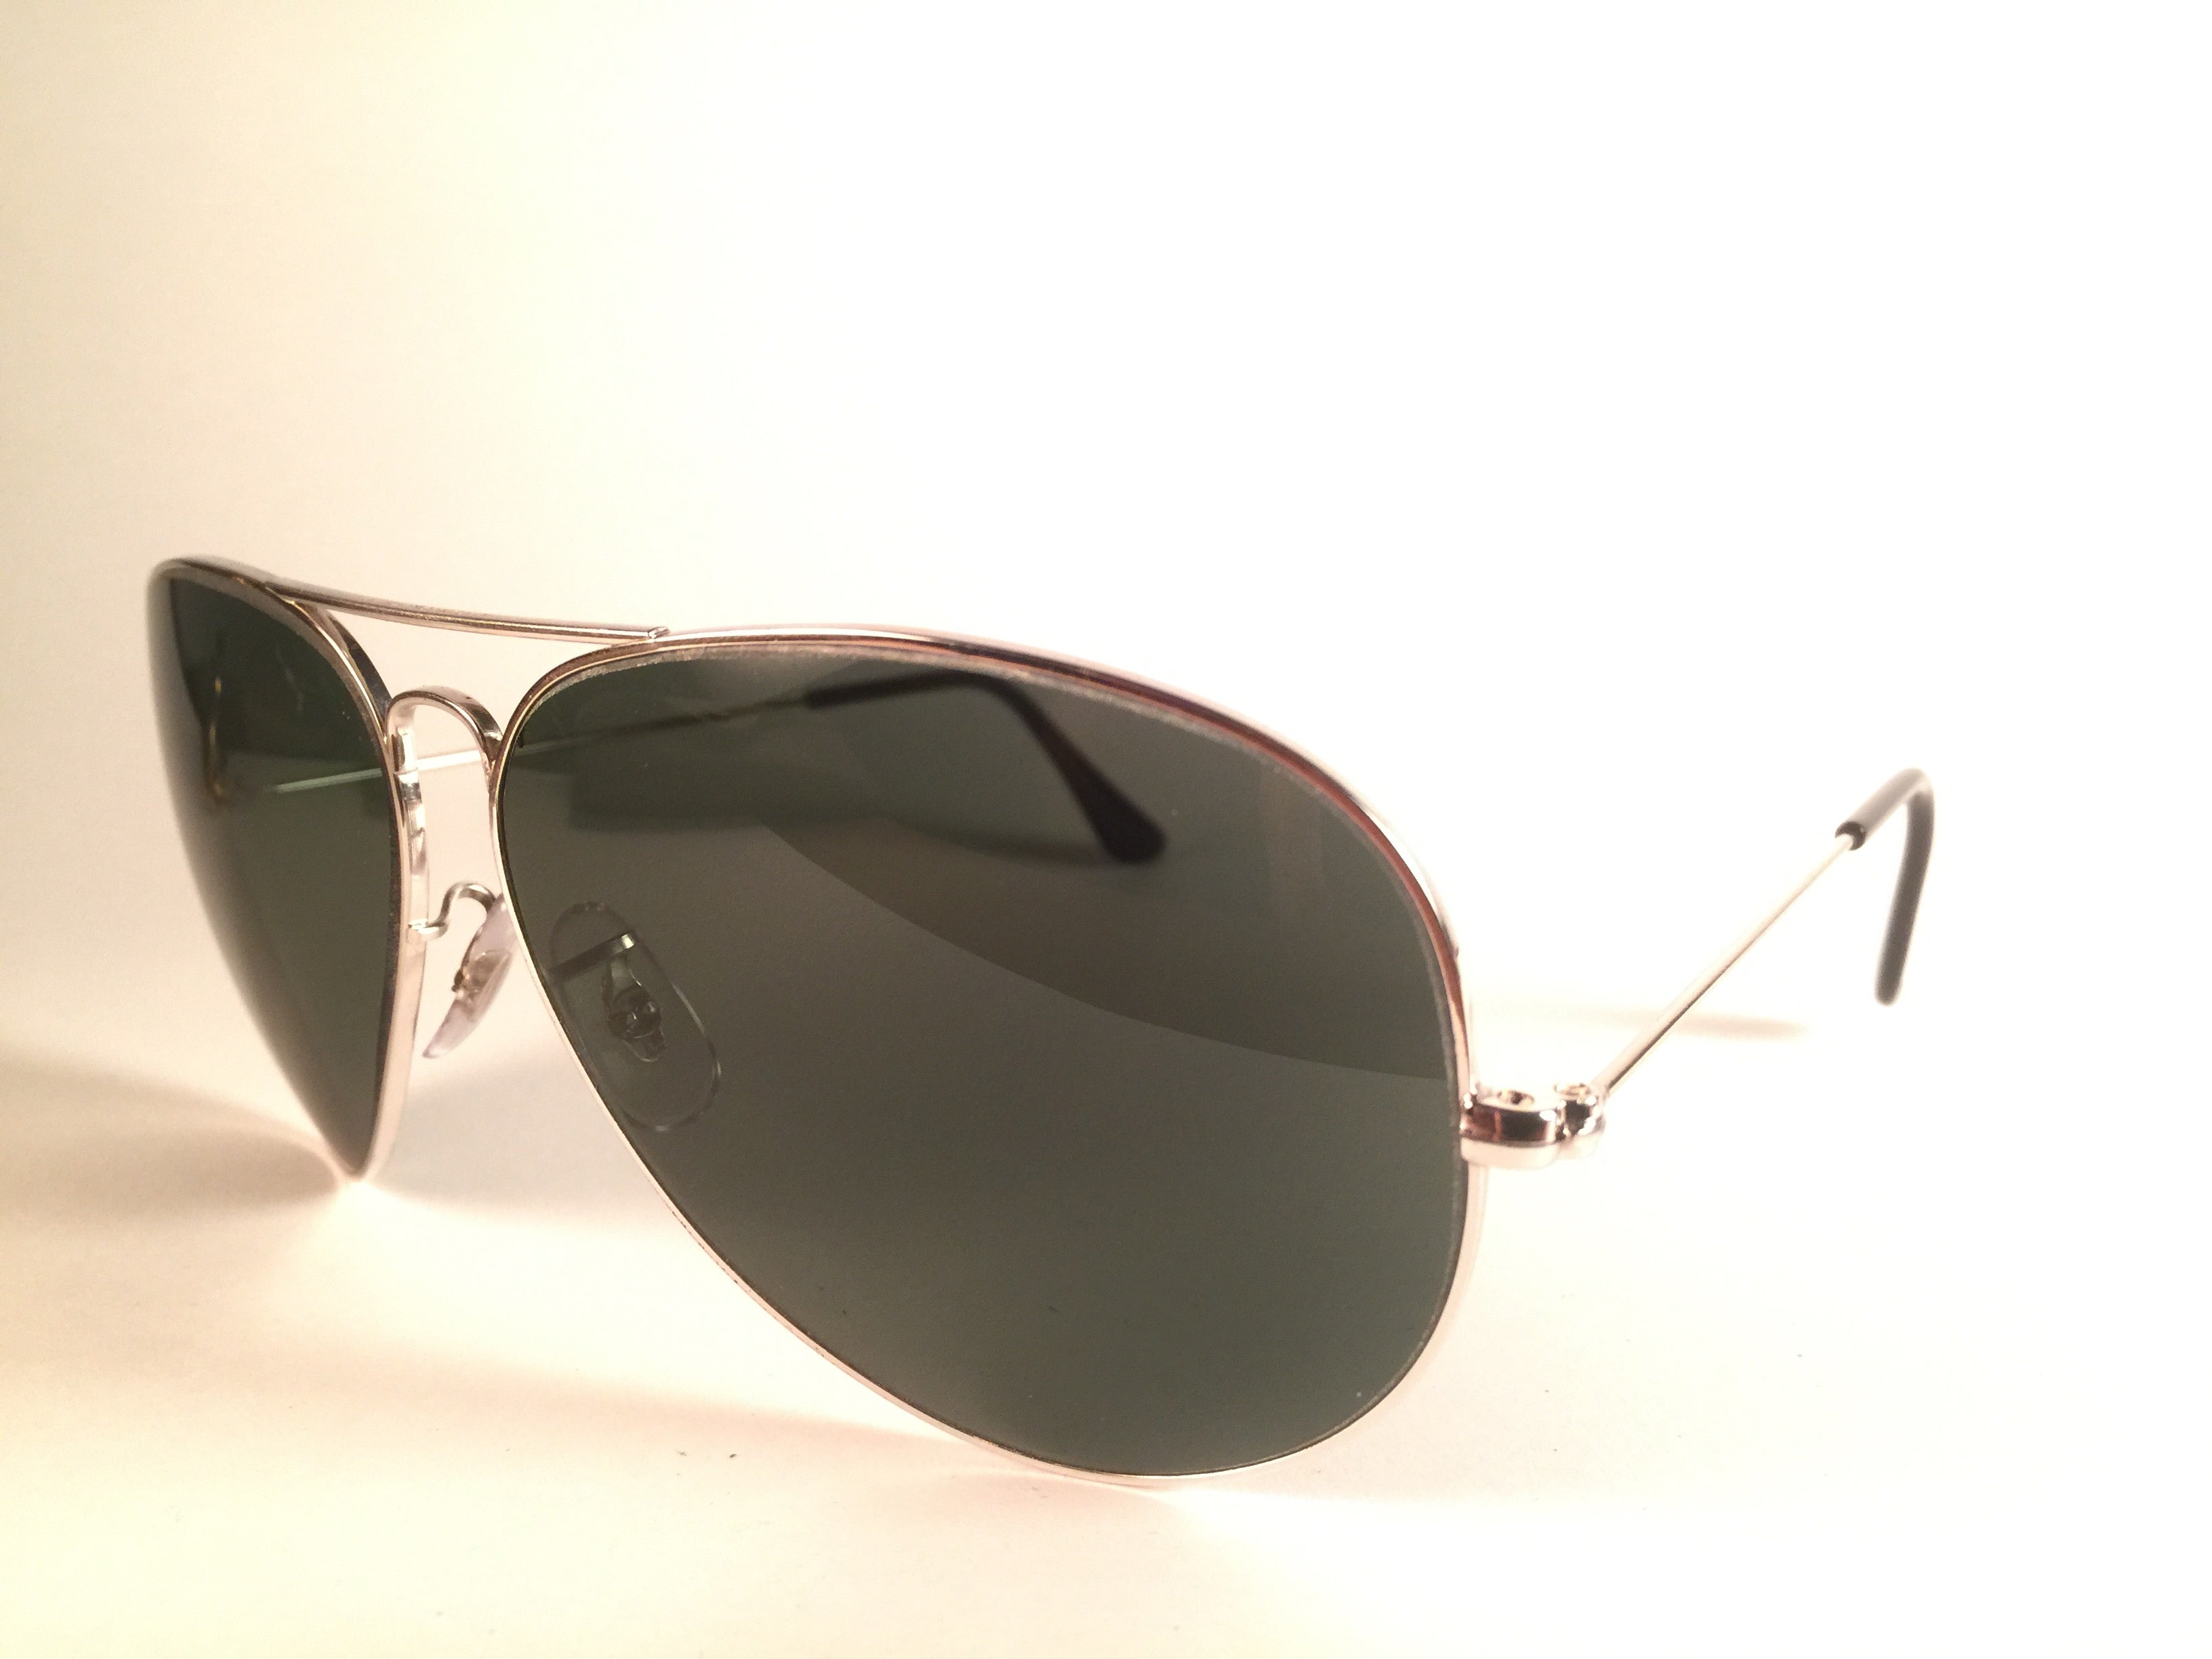 90c82ef7ae New Vintage Ray Ban Aviator 62Mm White Gold Grey G15 Lenses B L Sunglasses  at 1stdibs